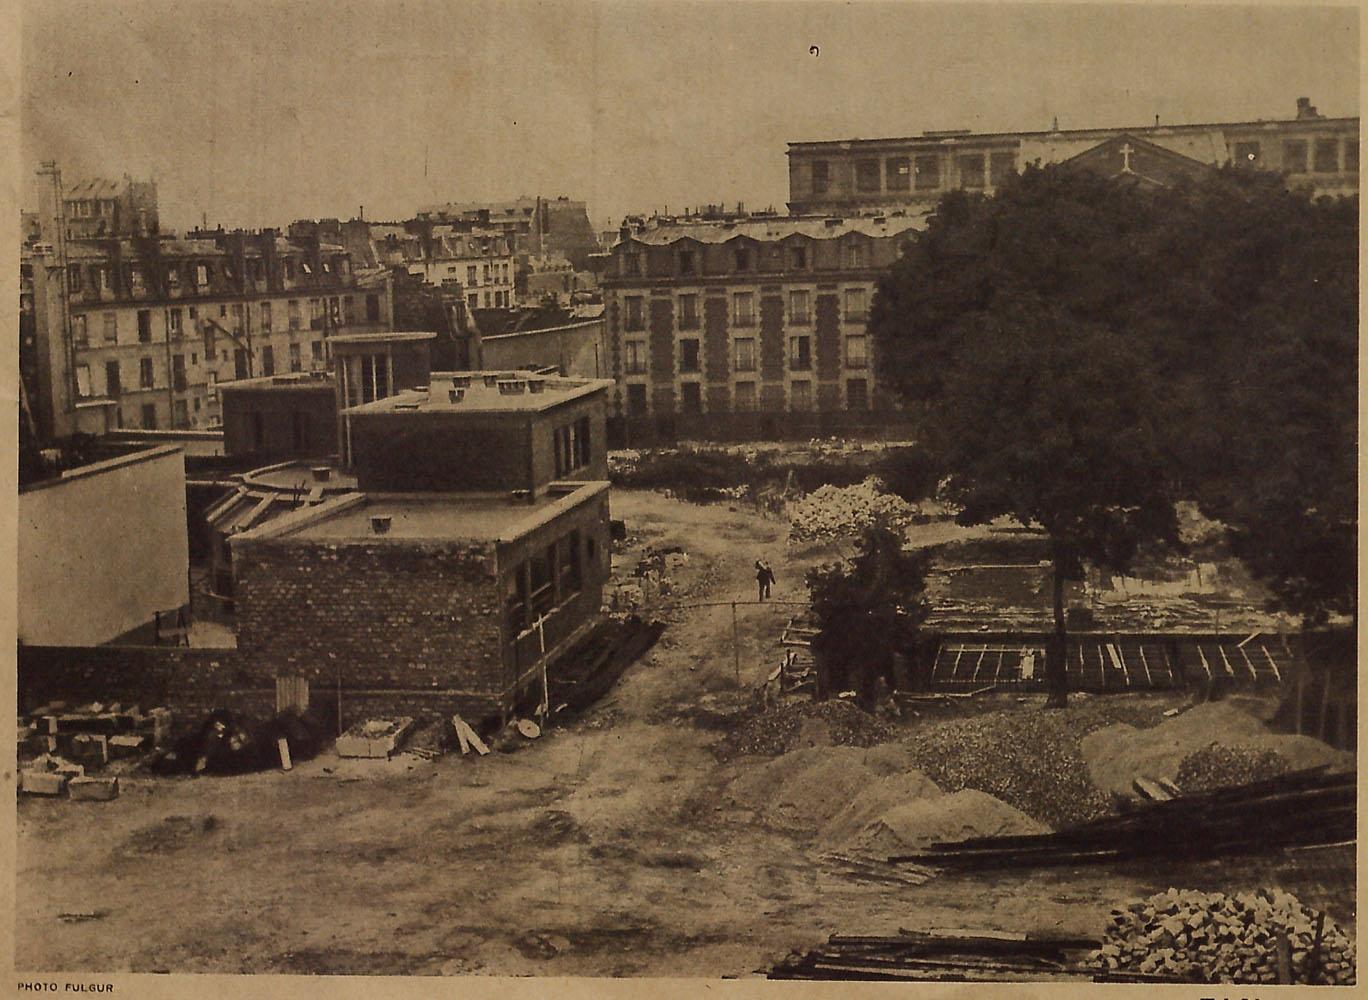 Demolition of Lazare